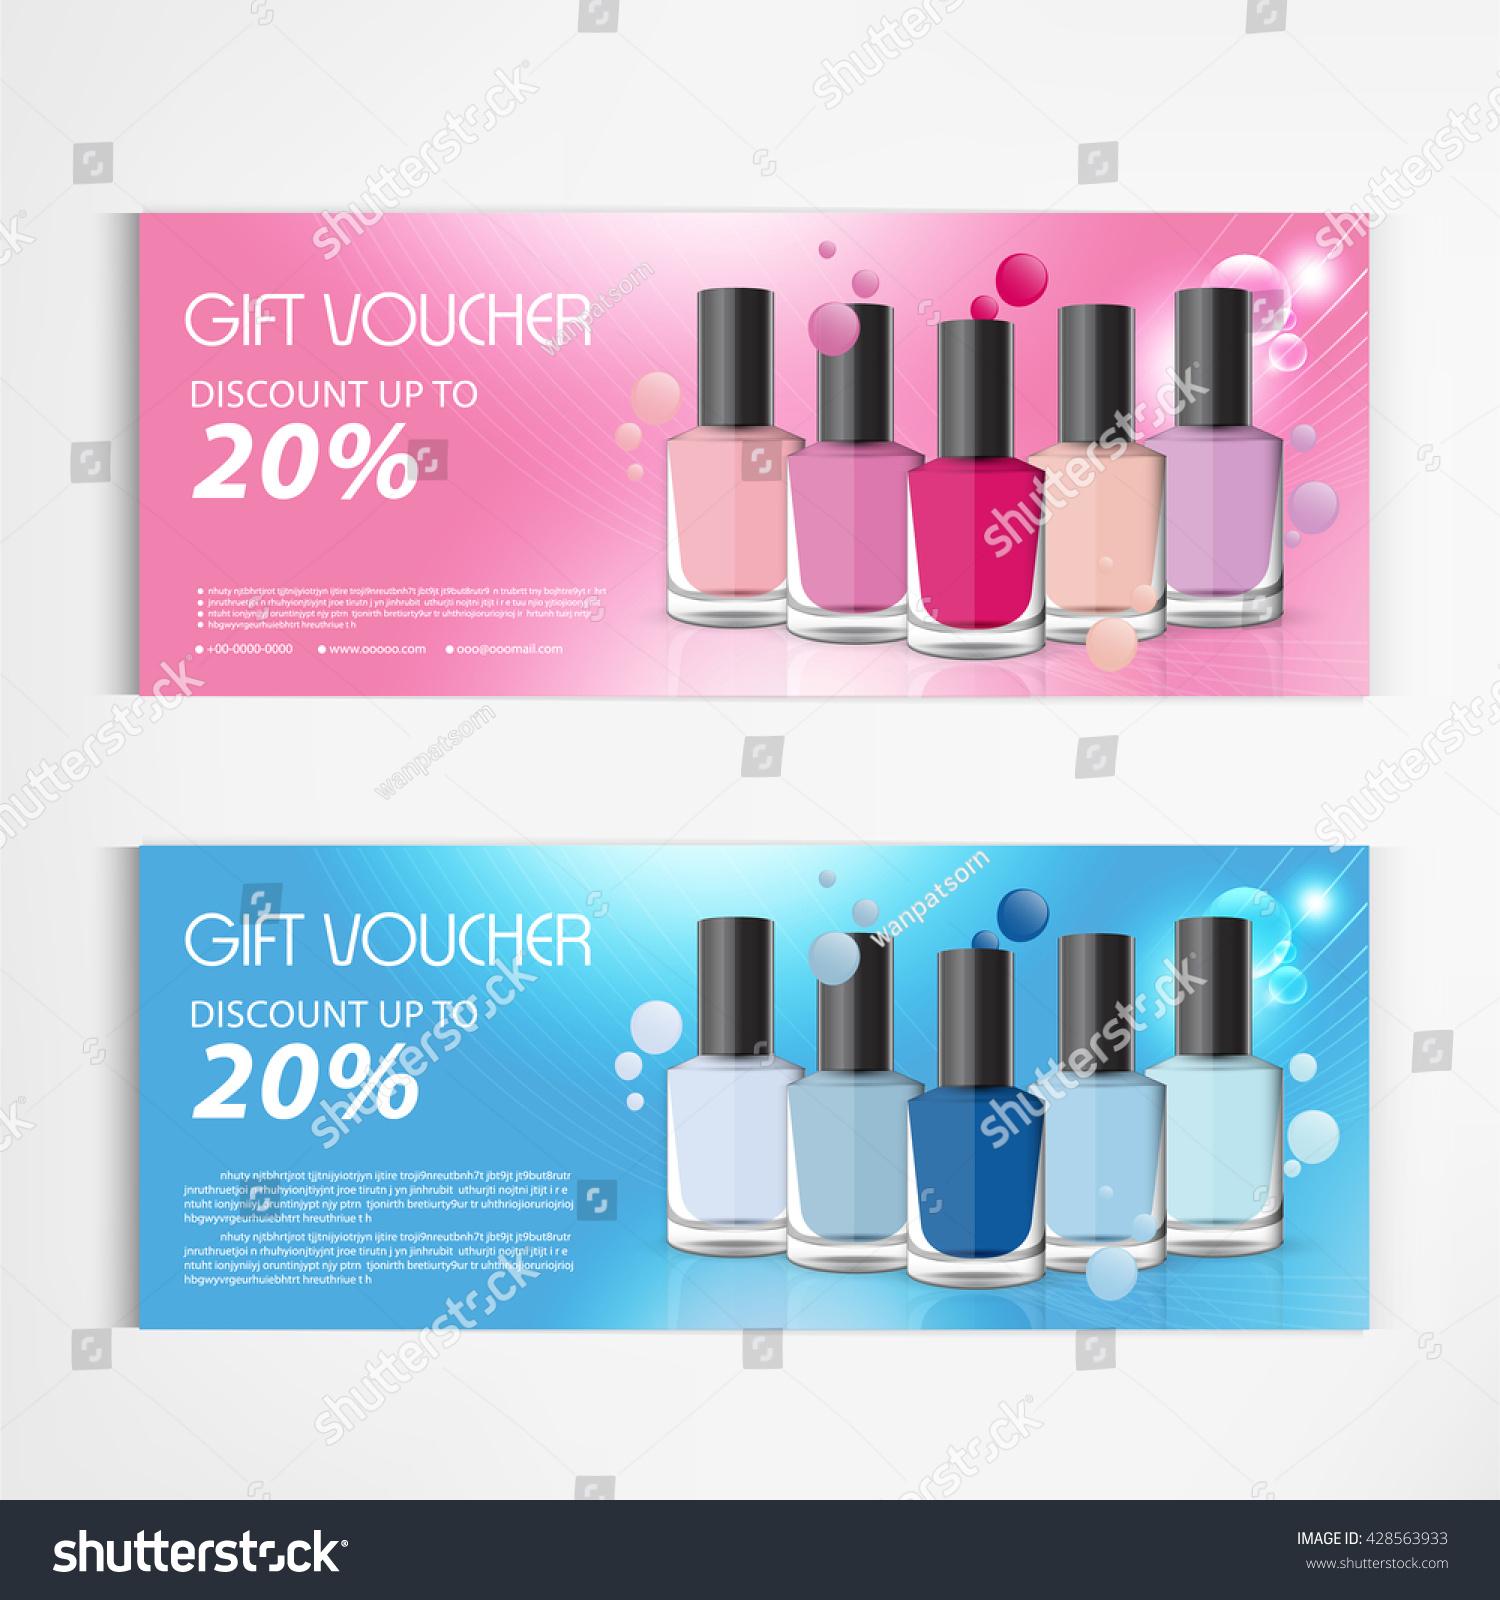 Gift Voucher Nail Polish Bottle Drop Stock Vector Royalty Free